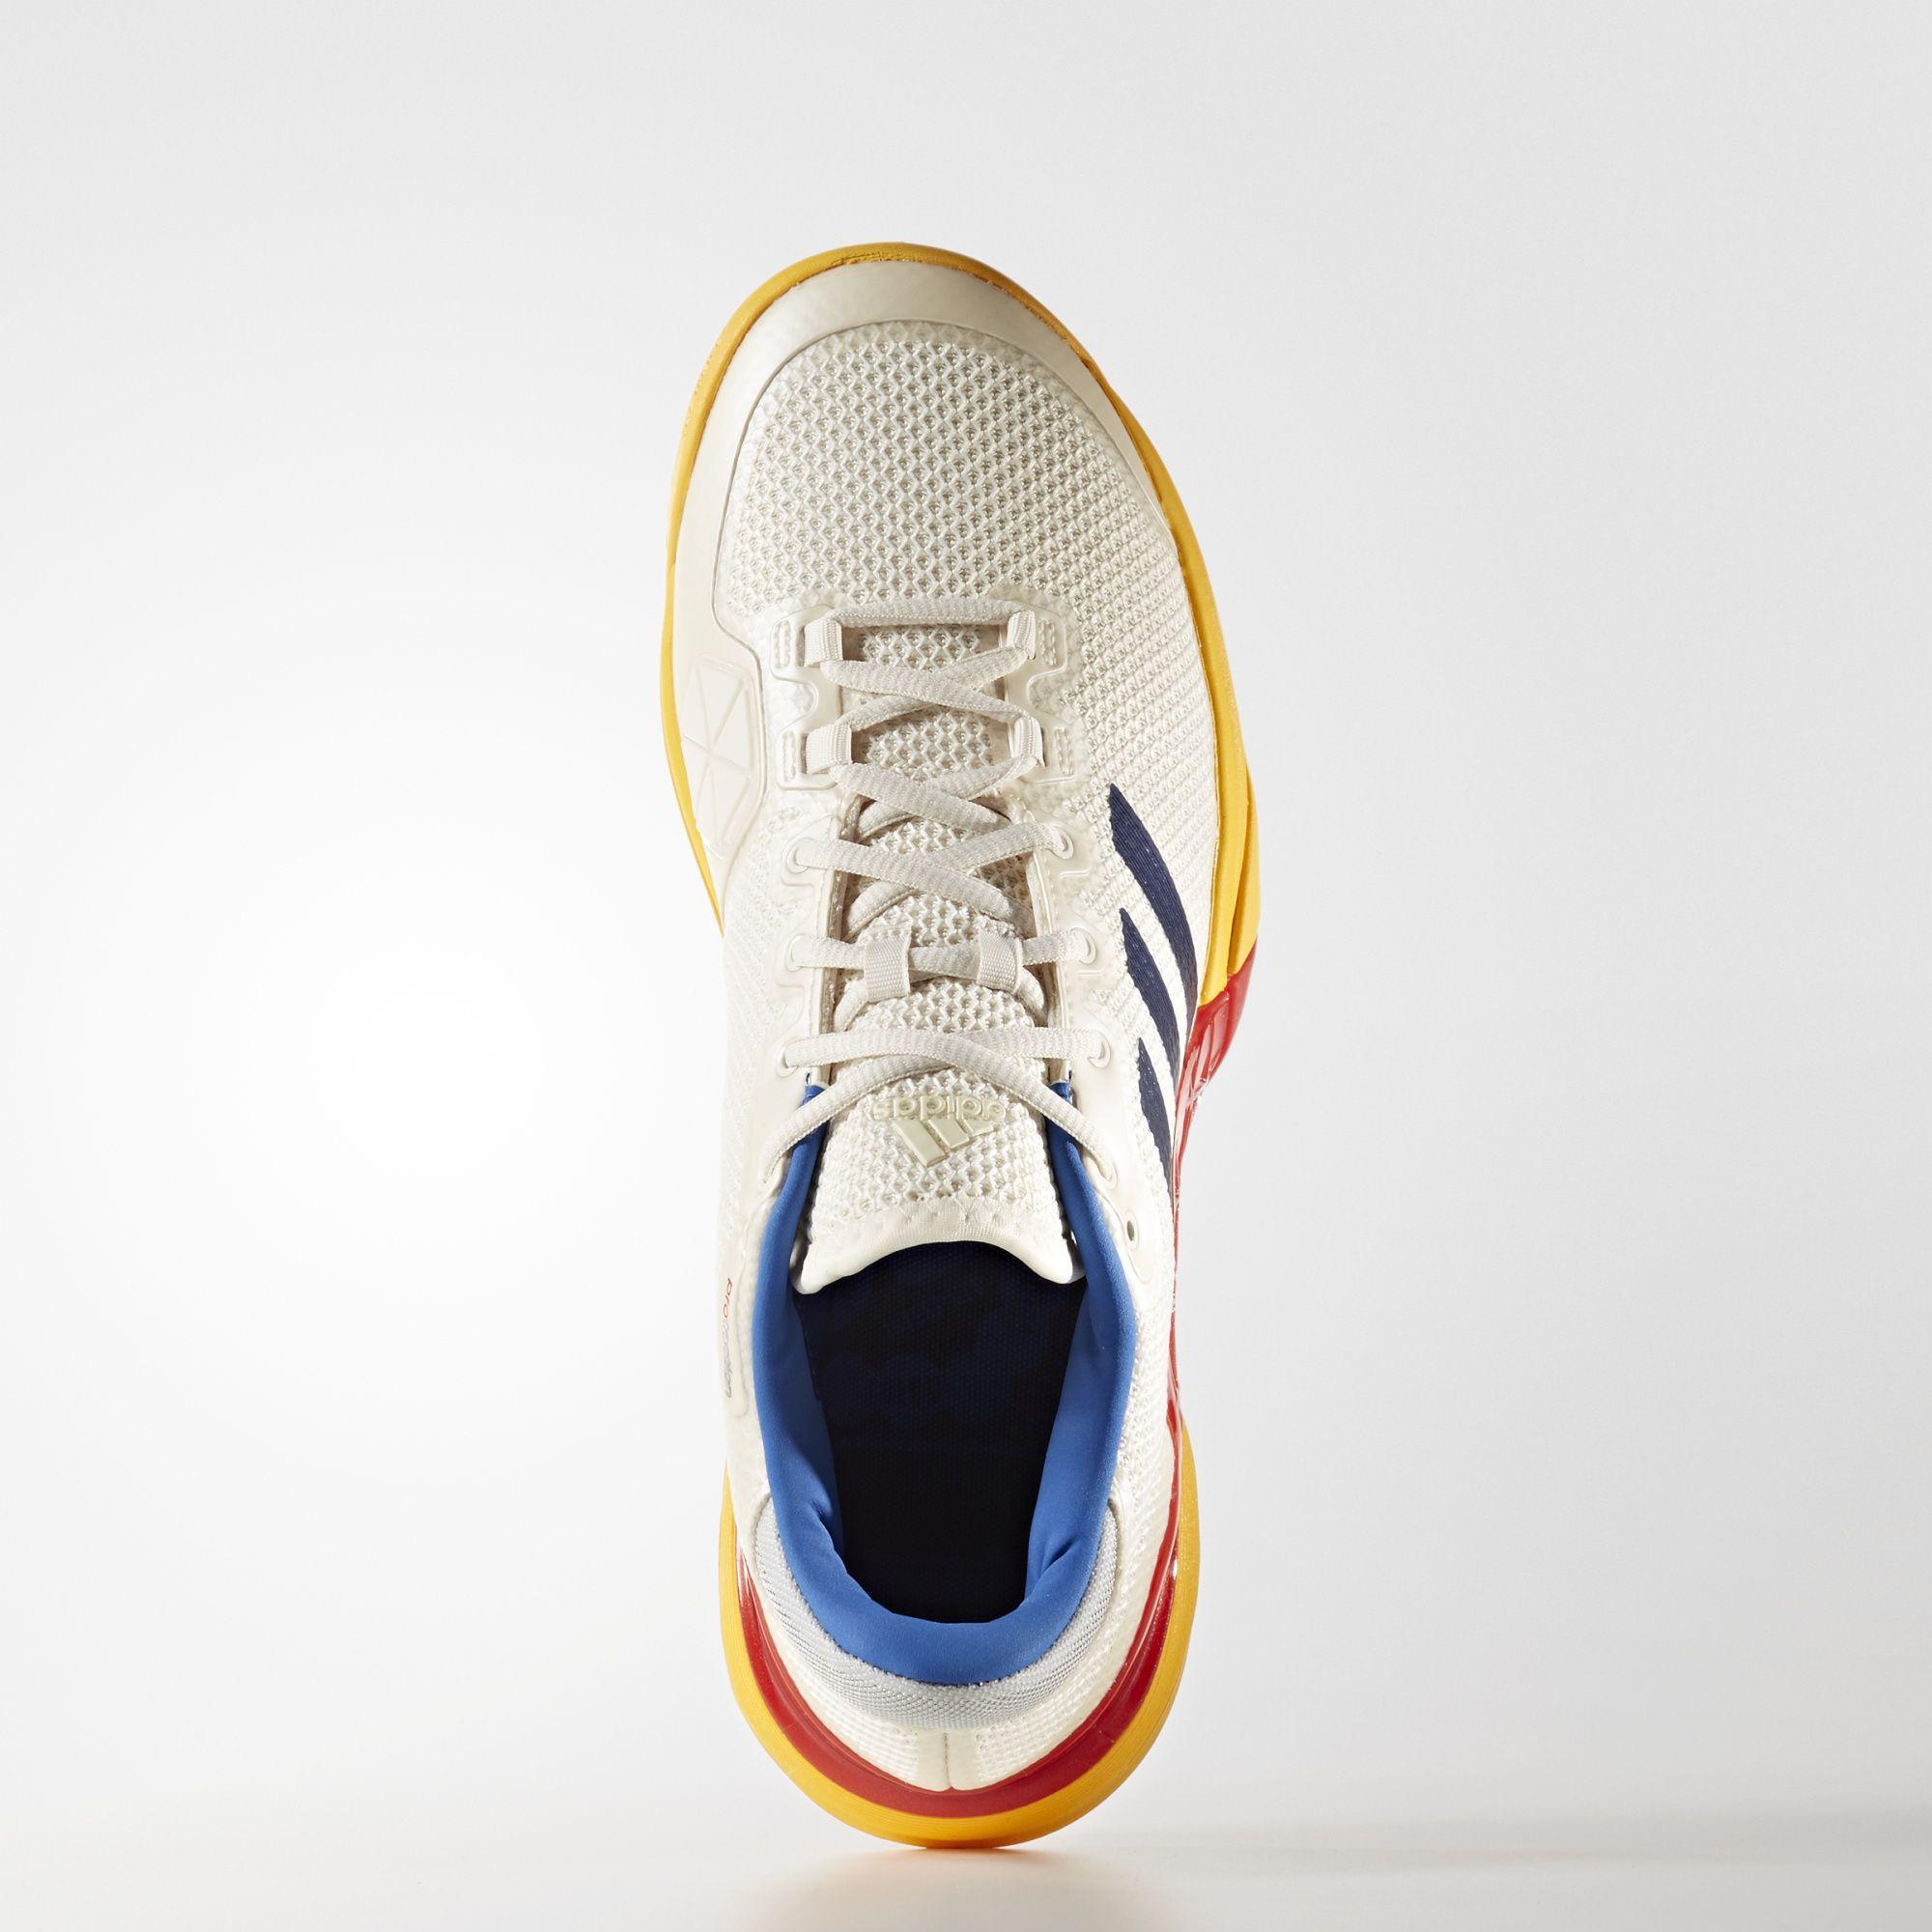 8c4acdfe7404 Adidas Mens Barricade 2017 Pharrell Williams Tennis Shoes - Multi-Colour